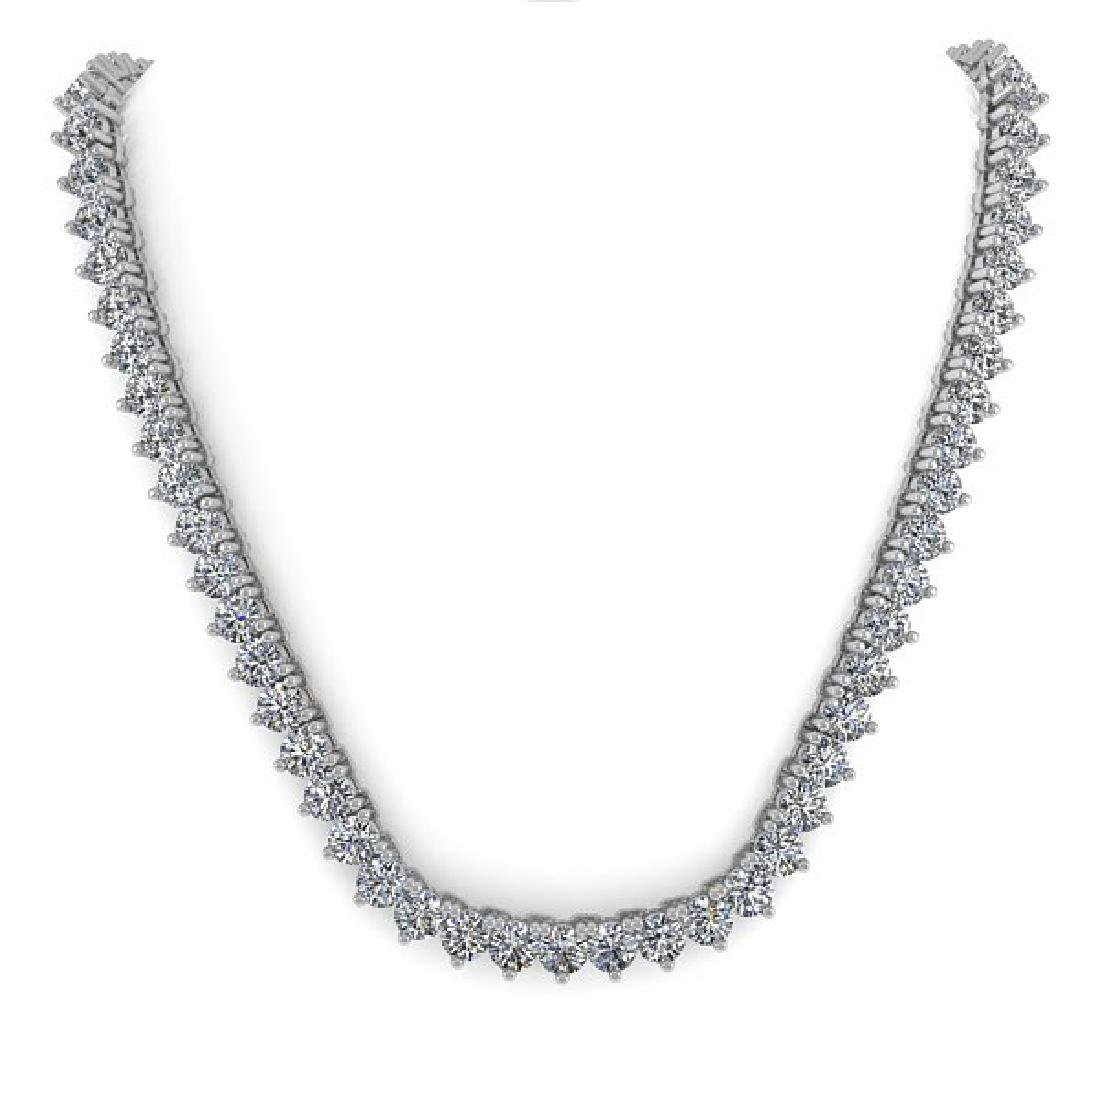 20 CTW Solitaire VS/SI Diamond Necklace 18K White Gold - 3